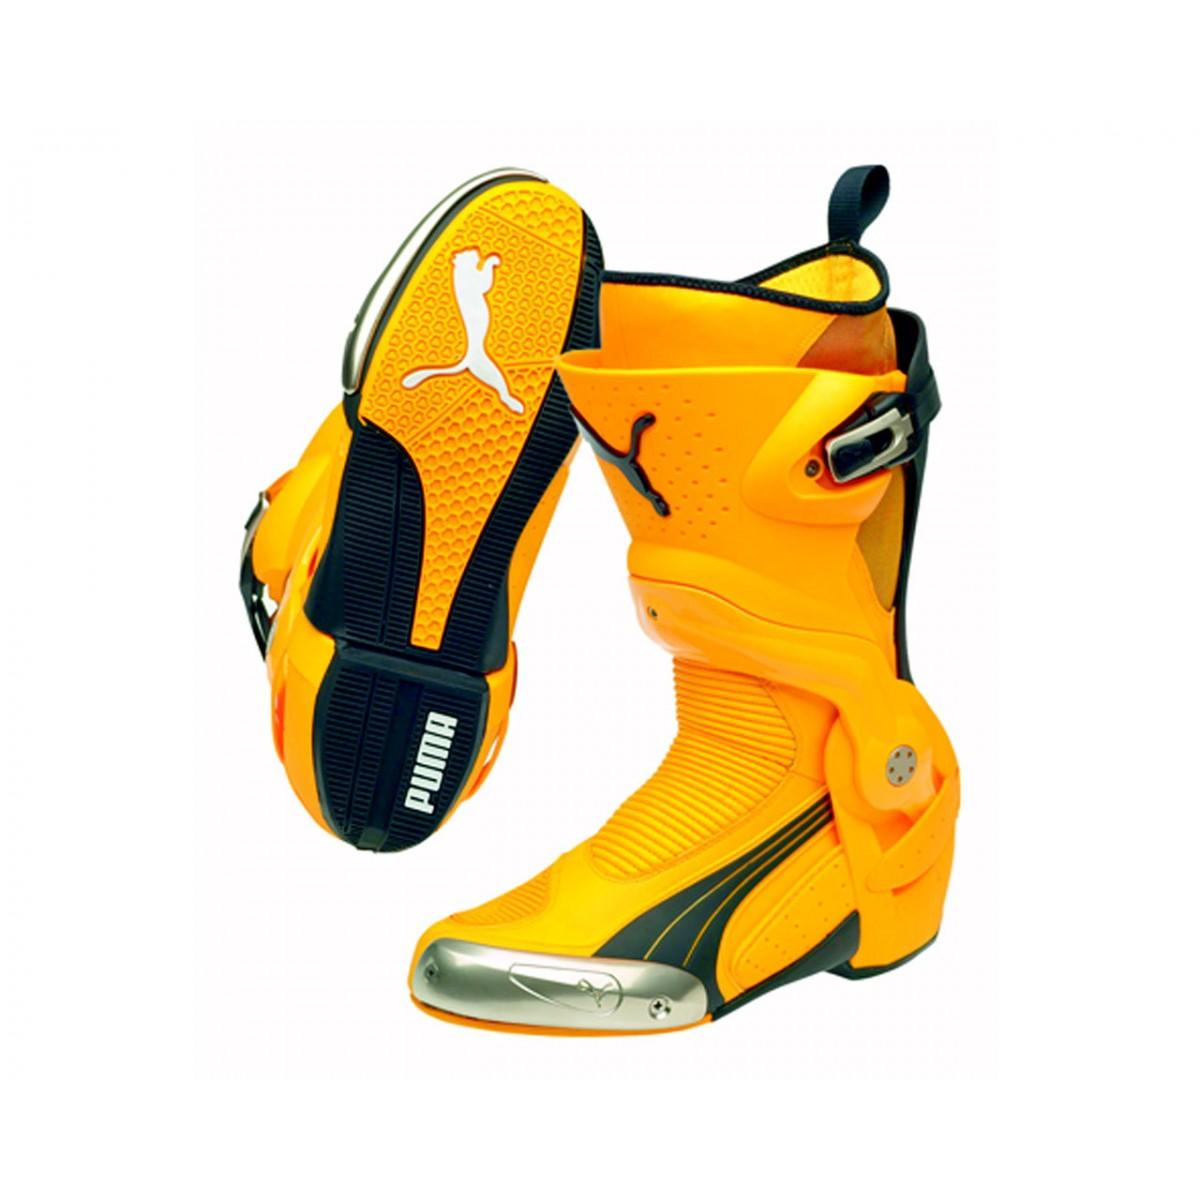 Botas Puma 1000 V2 amarillo, compra online